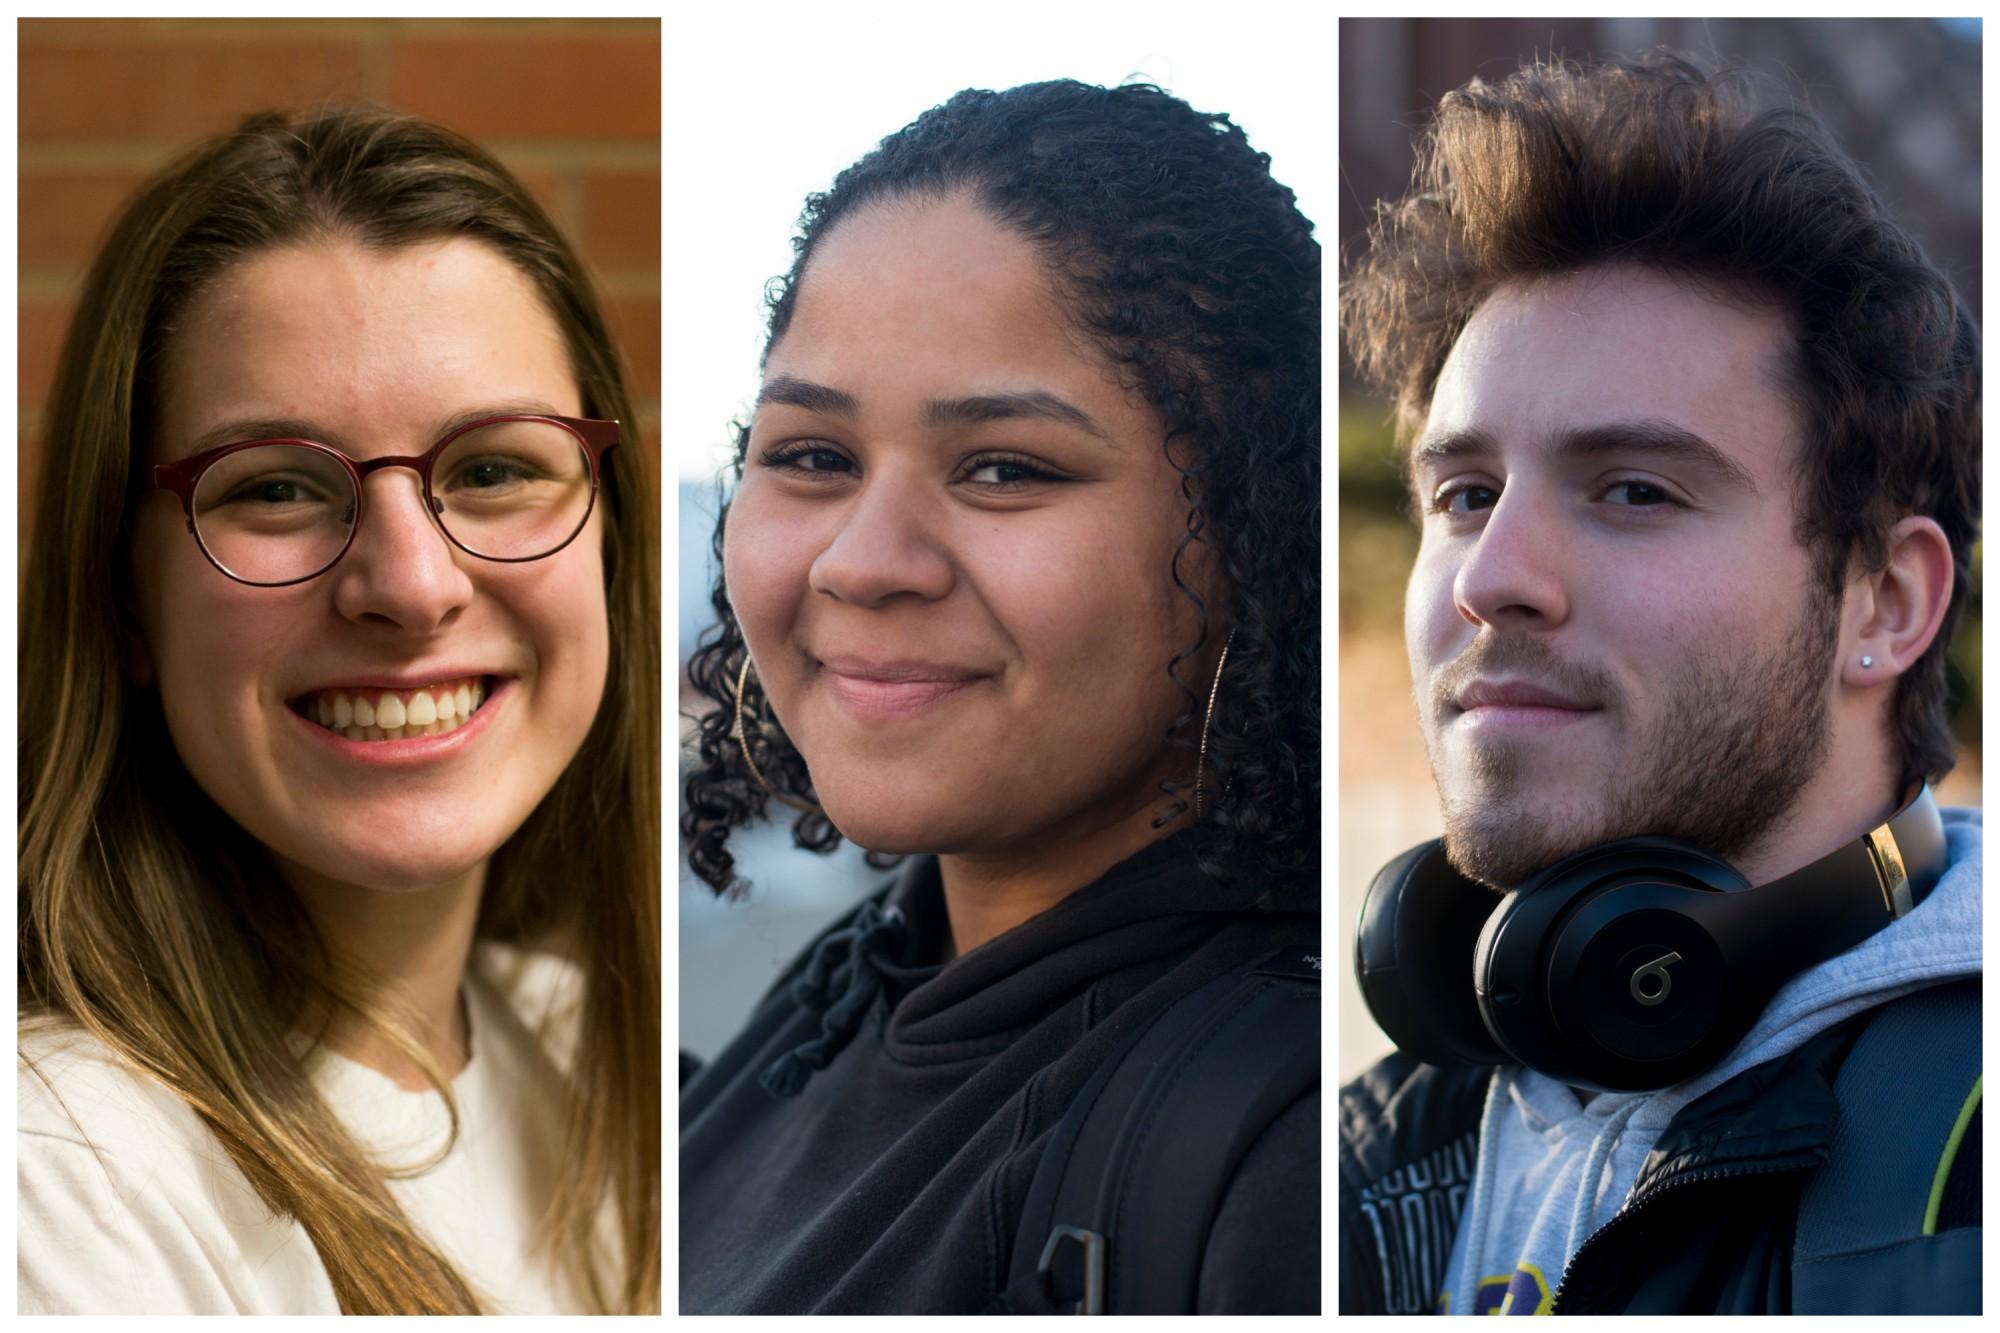 From left, Meghan Cahill, Neesha Moore, Jack Kappel pose for portraits on Monday, Feb. 24.